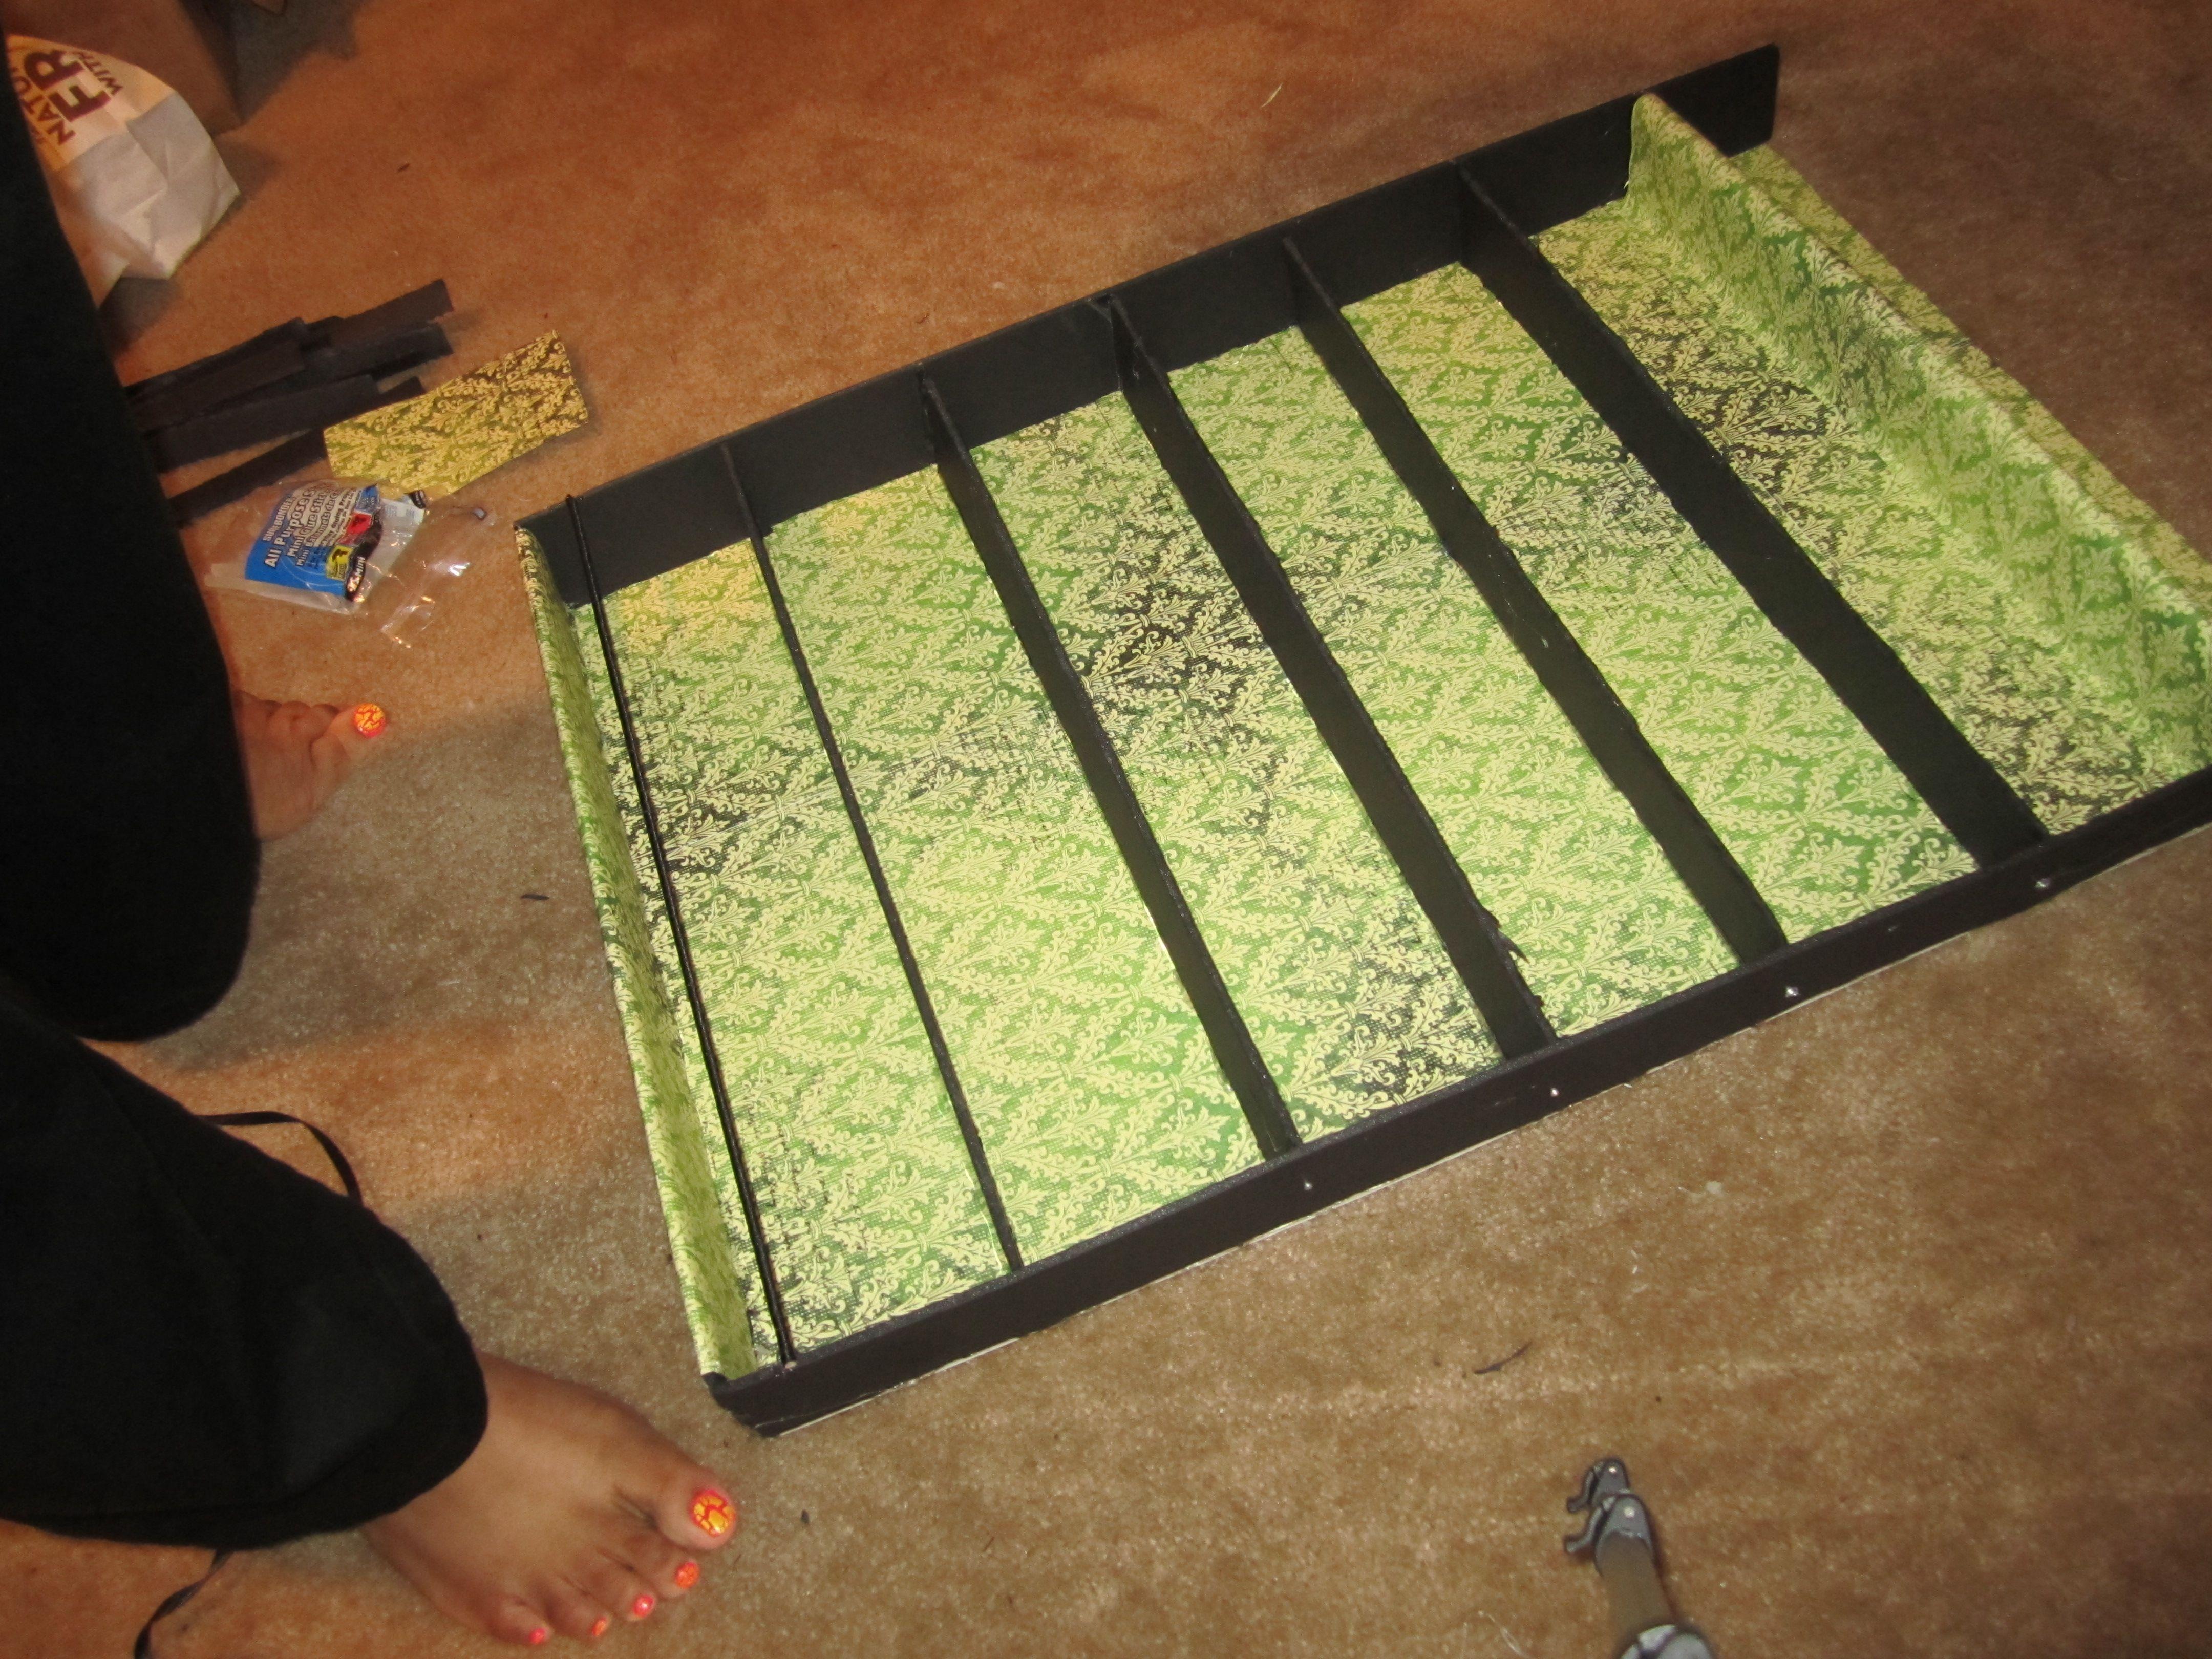 nail polish organizer | How to Build a Nail Polish Rack - DIY | The ...